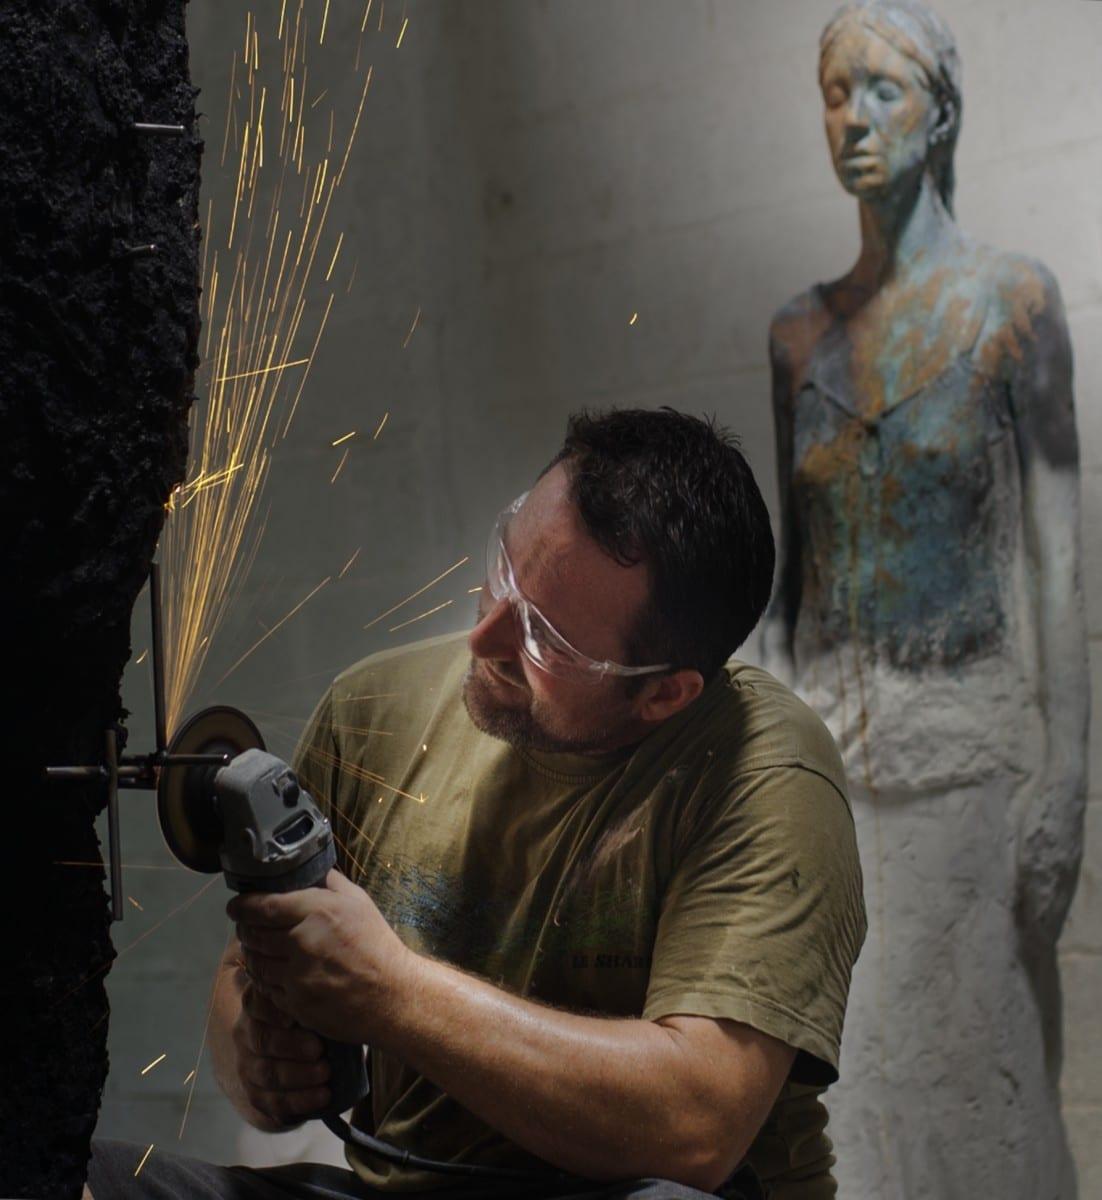 Self portrait in studio, 2013 © Jason deCaires Taylor